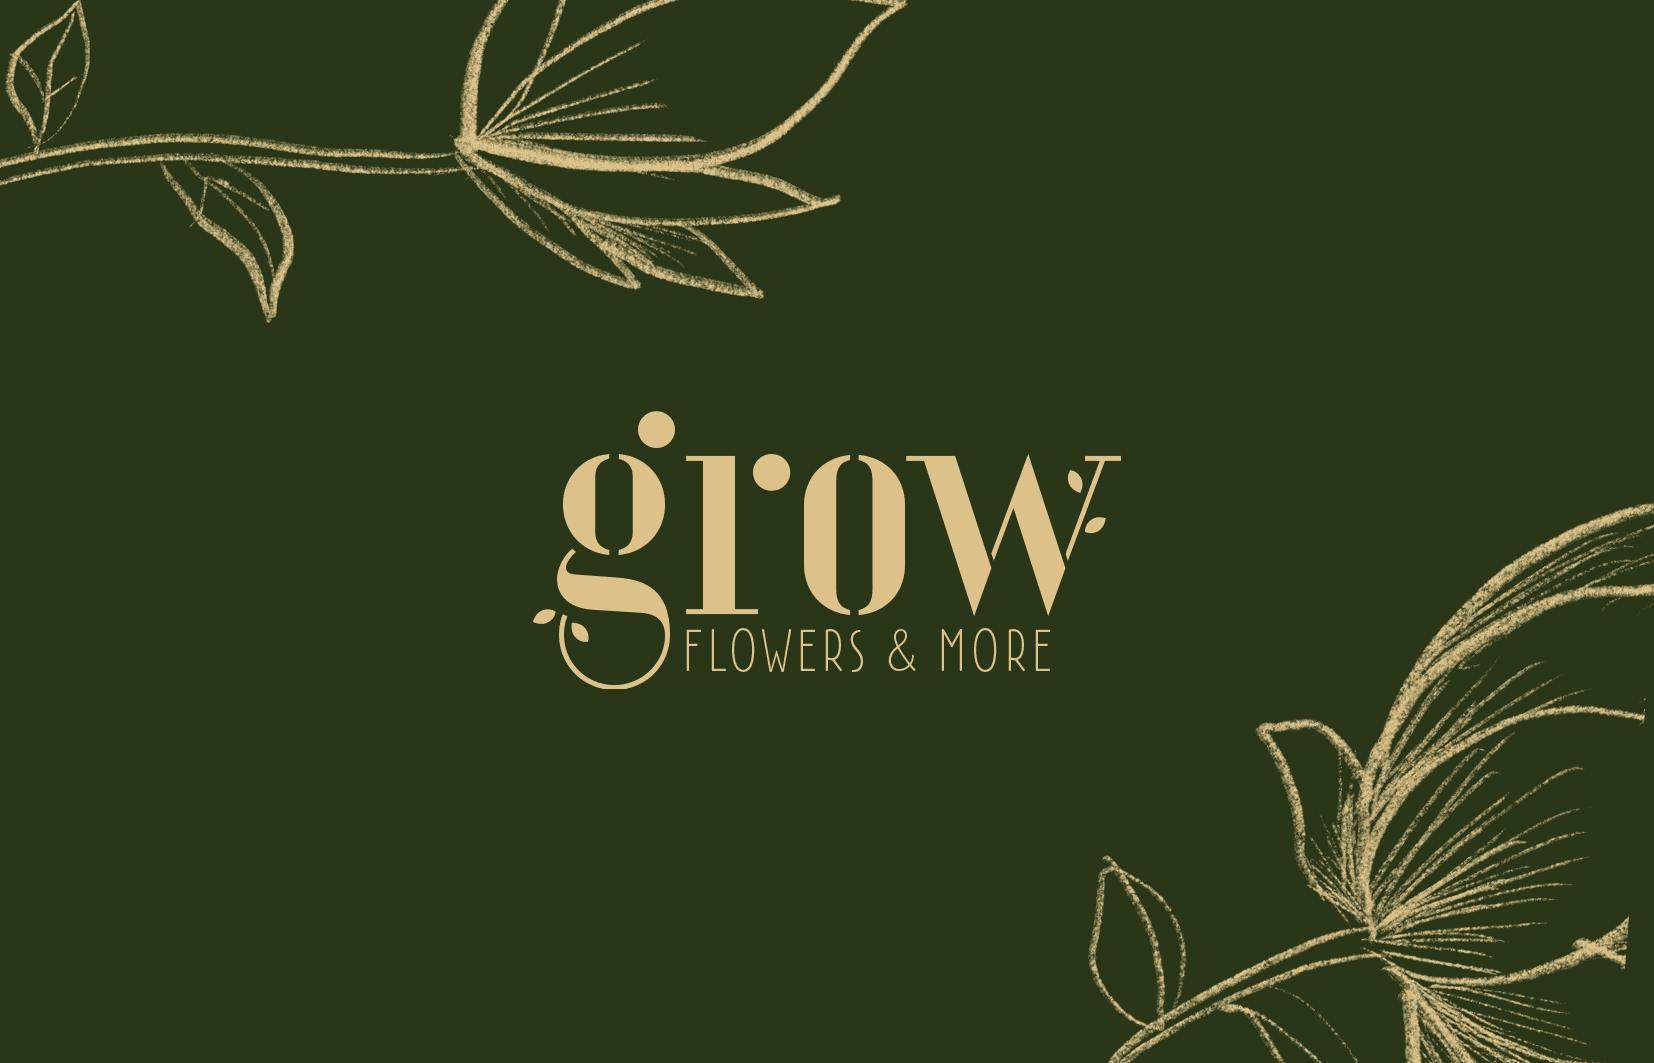 Grow-brand-print-design-Barbara-Valentini-01